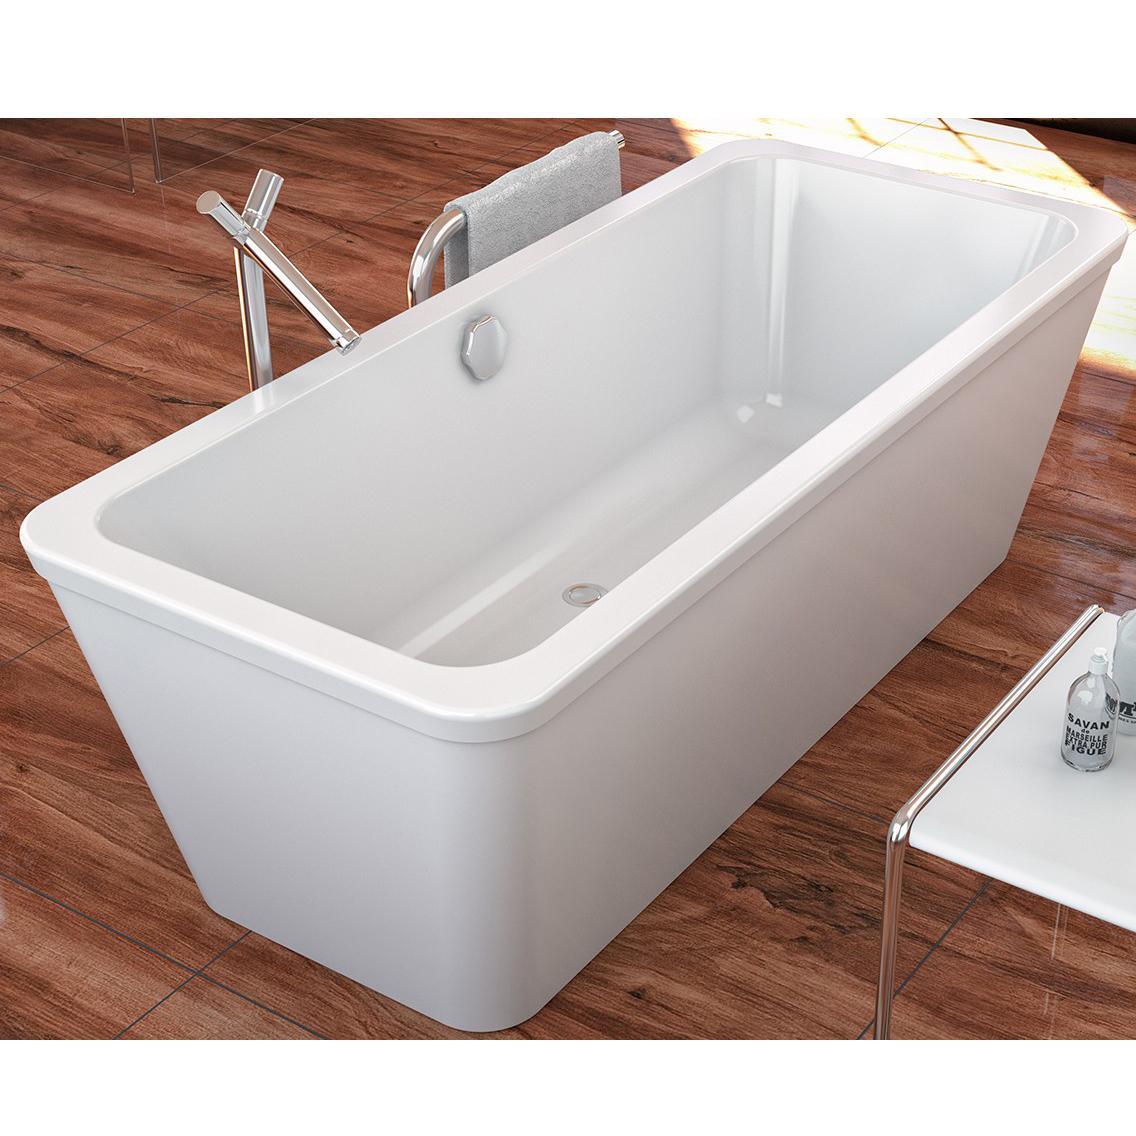 Акриловая ванна Kolpa san Eroica 180x80 basis акриловая ванна kolpa rapido rapido basis 180 180x80